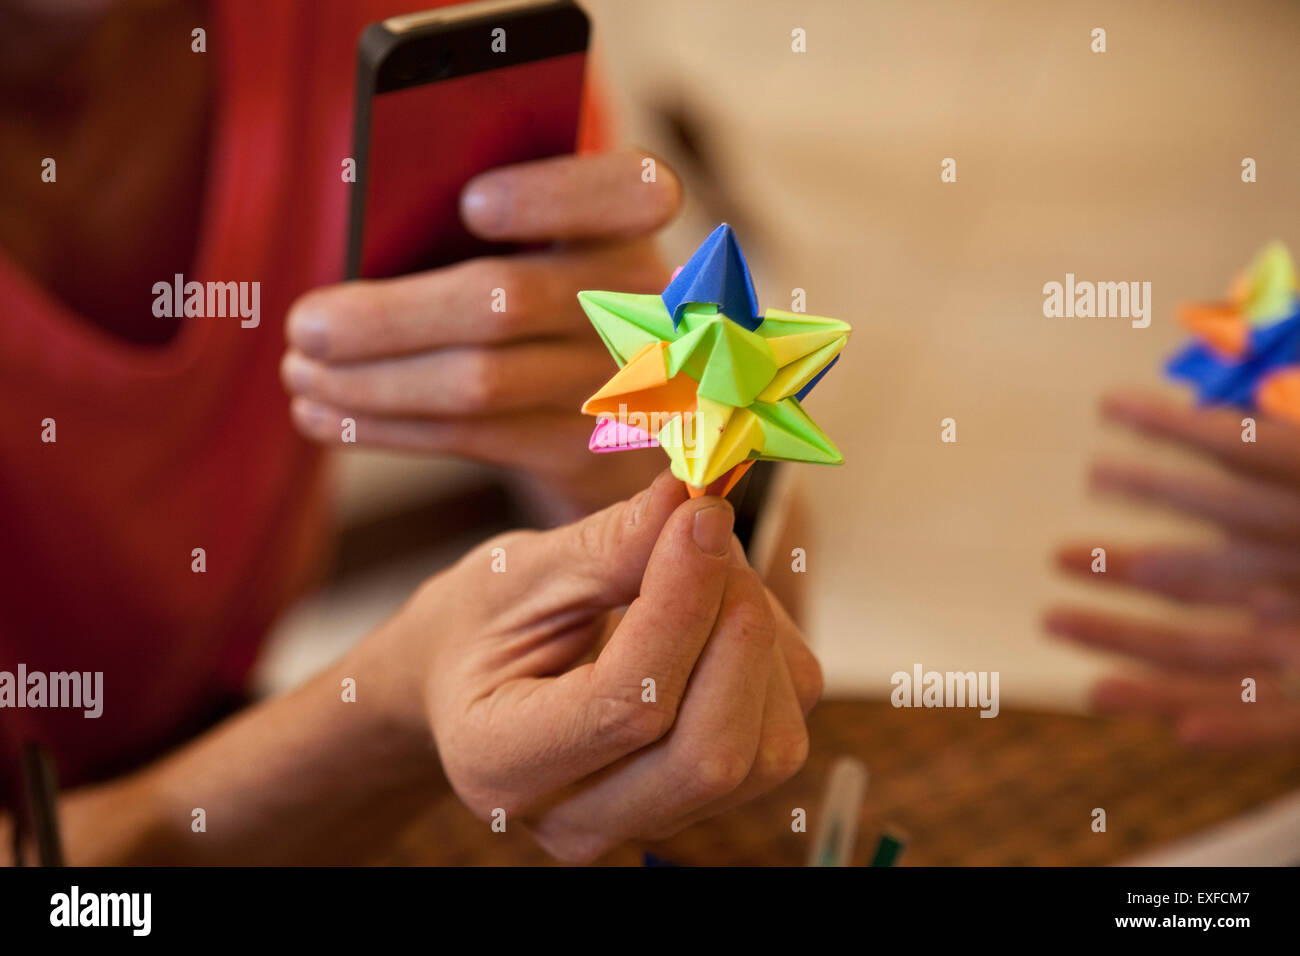 Studenten, die Origami Papier Spiel Stockbild